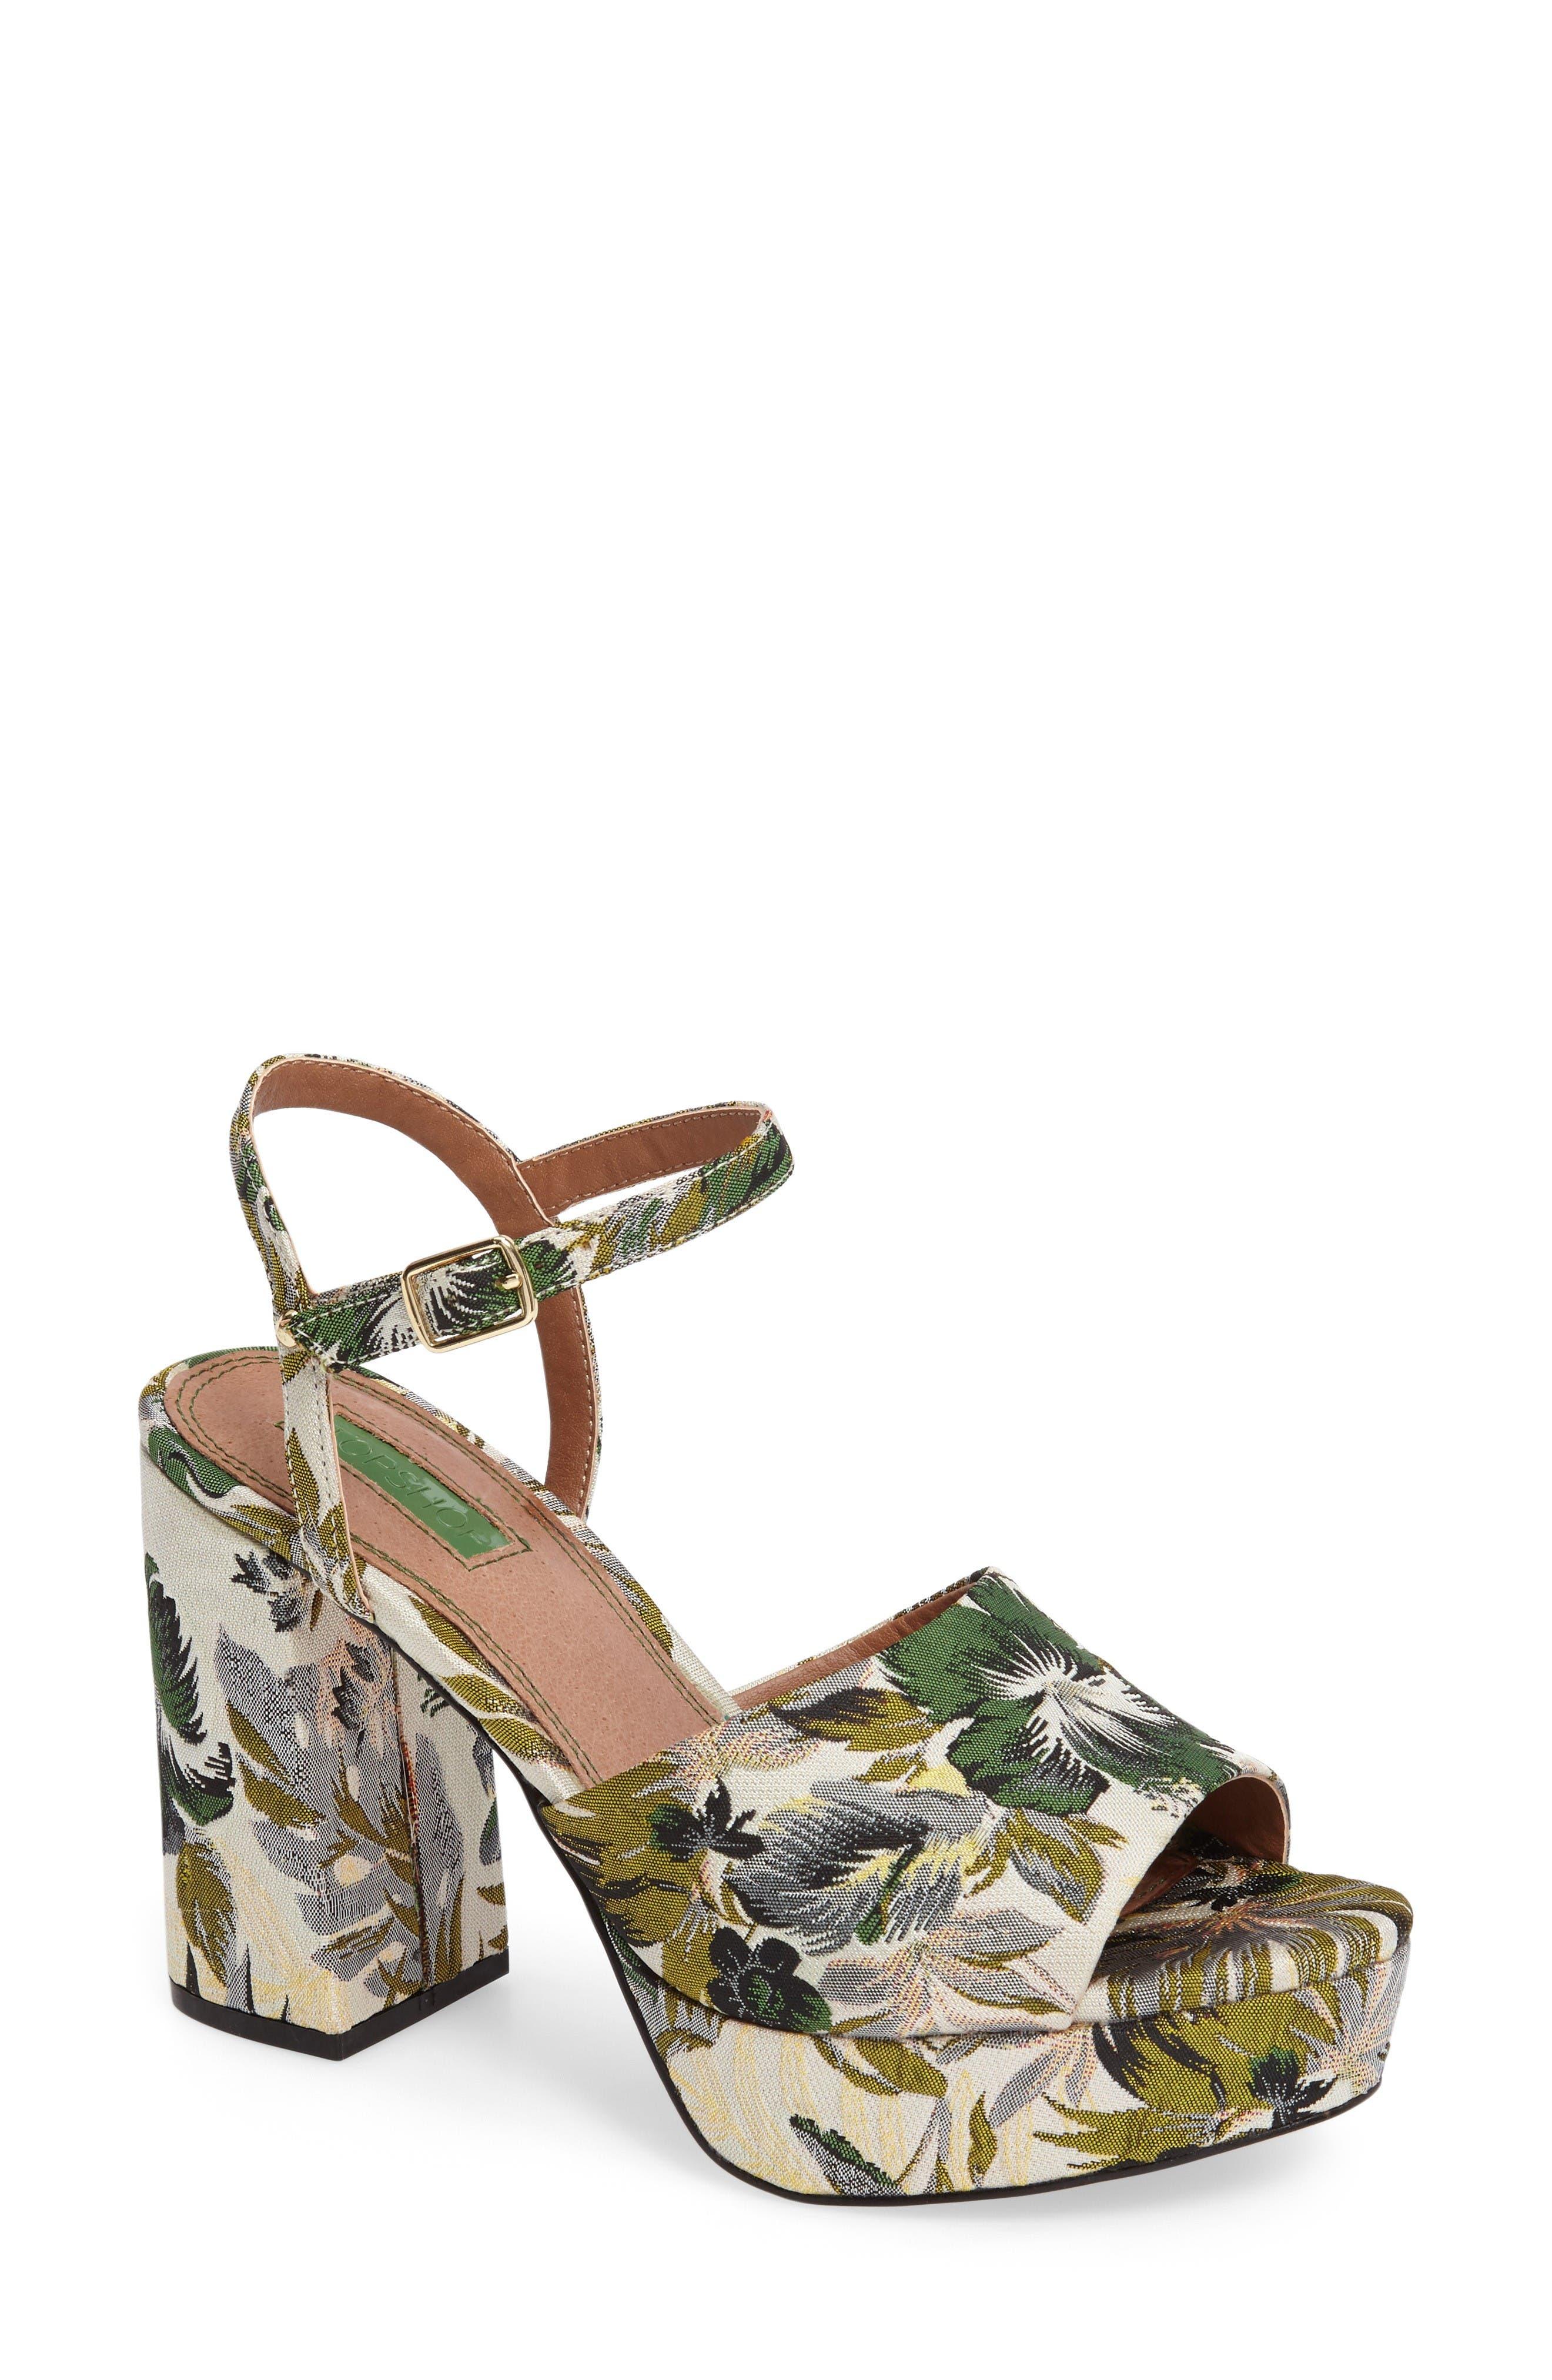 Alternate Image 1 Selected - Topshop Lava Platform Sandal (Women)